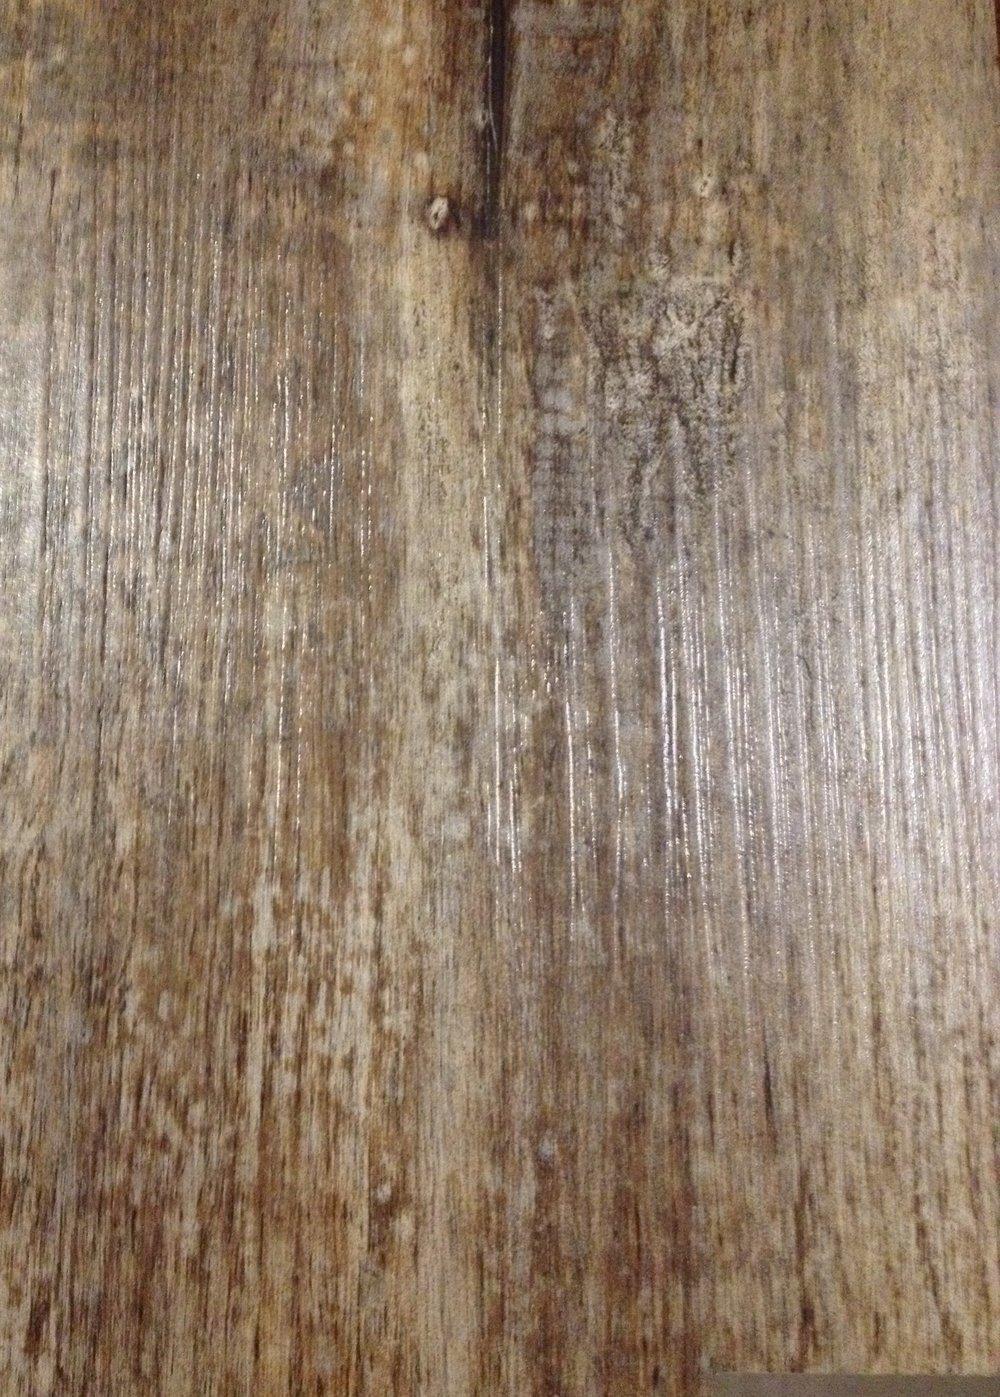 Shaw-P-Modeled Oak